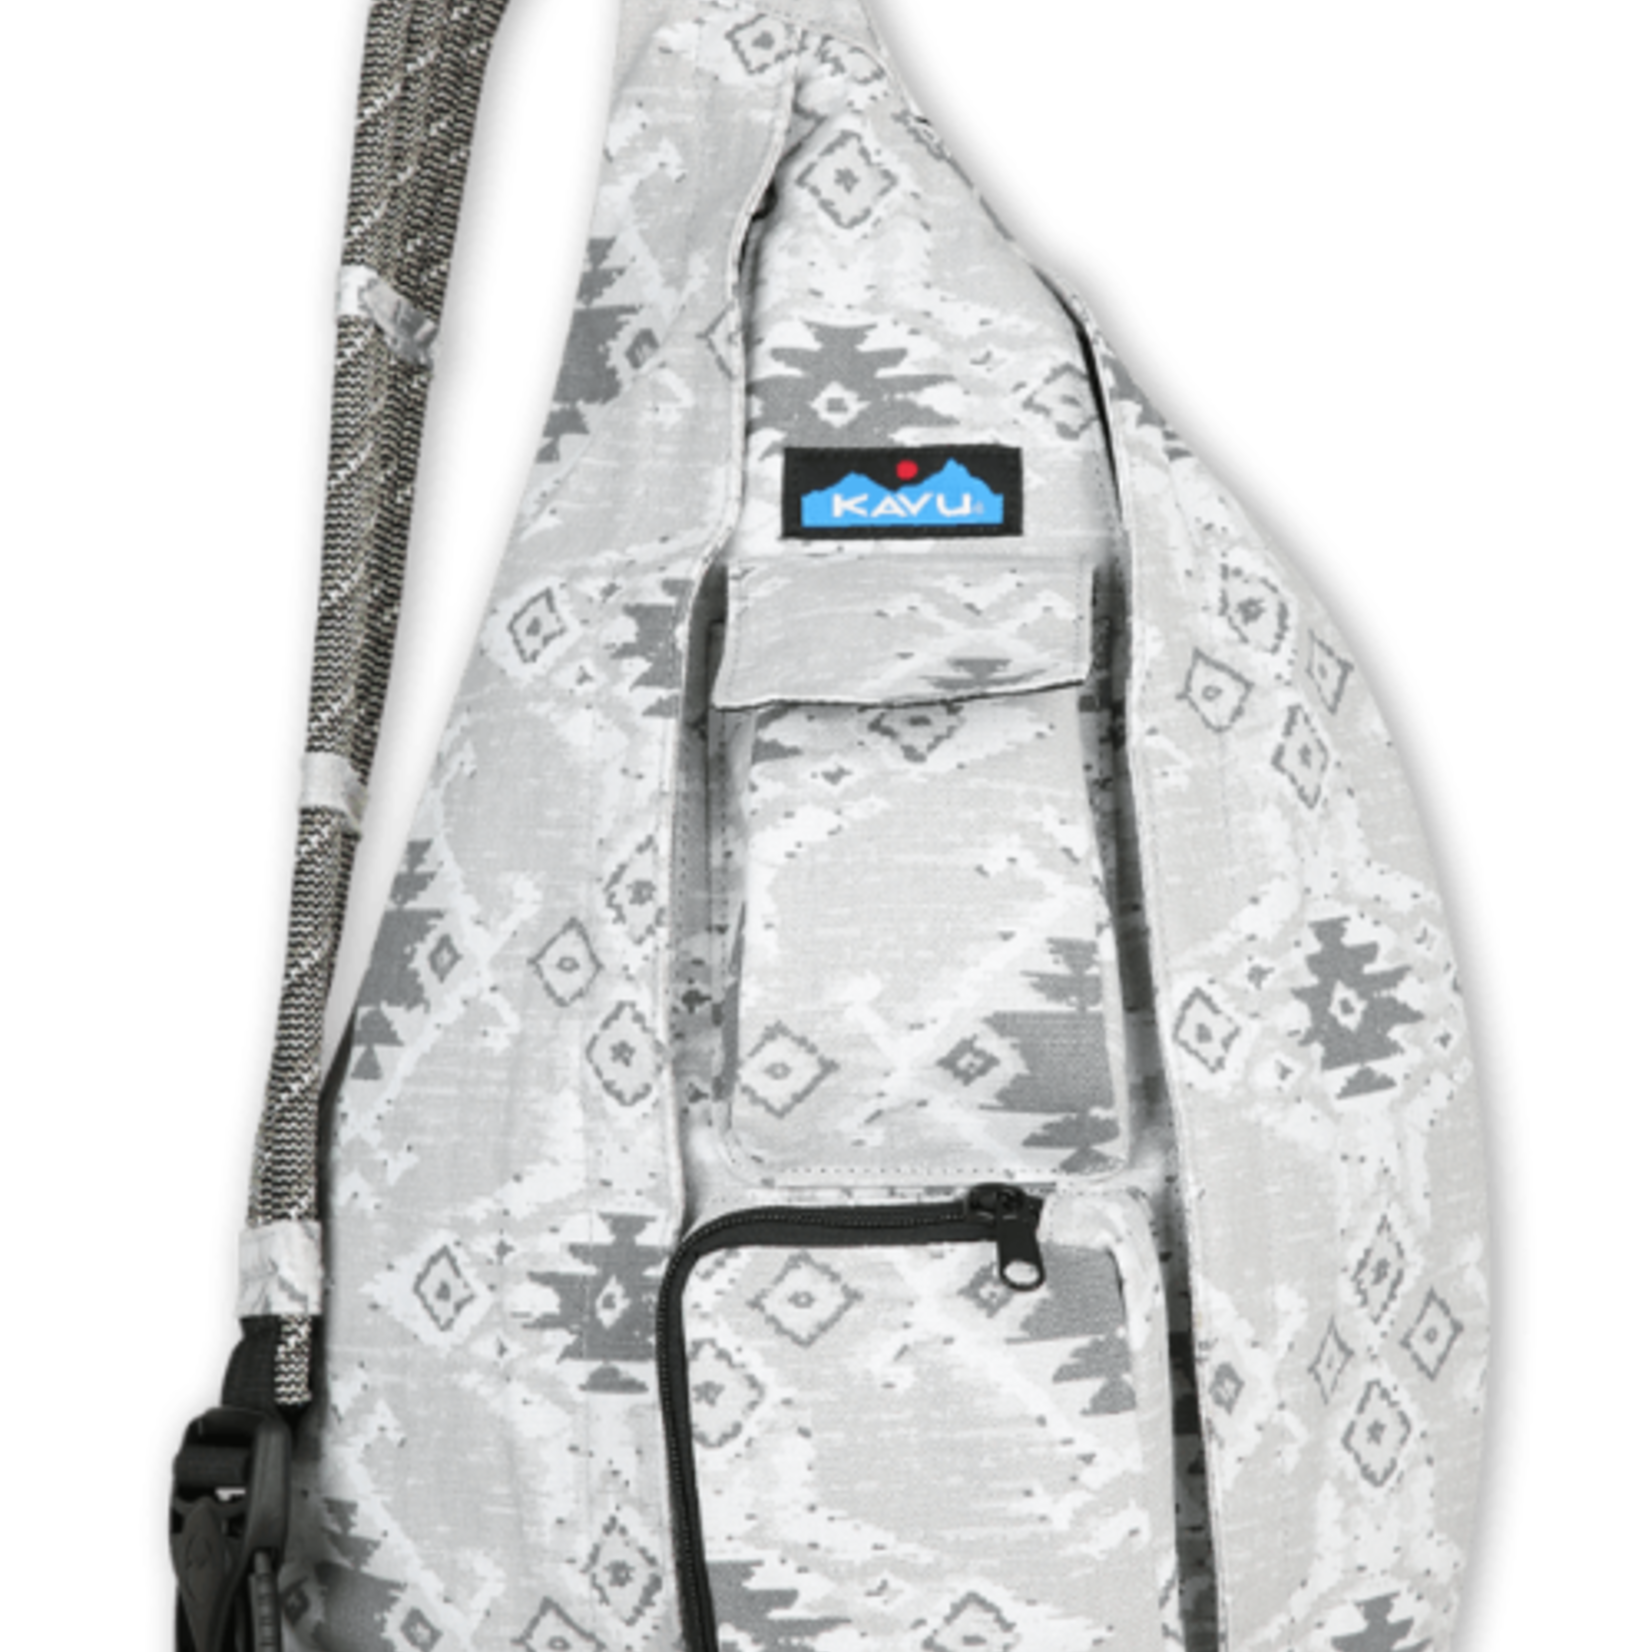 Kavu Kavu Rope Bag - P-136221